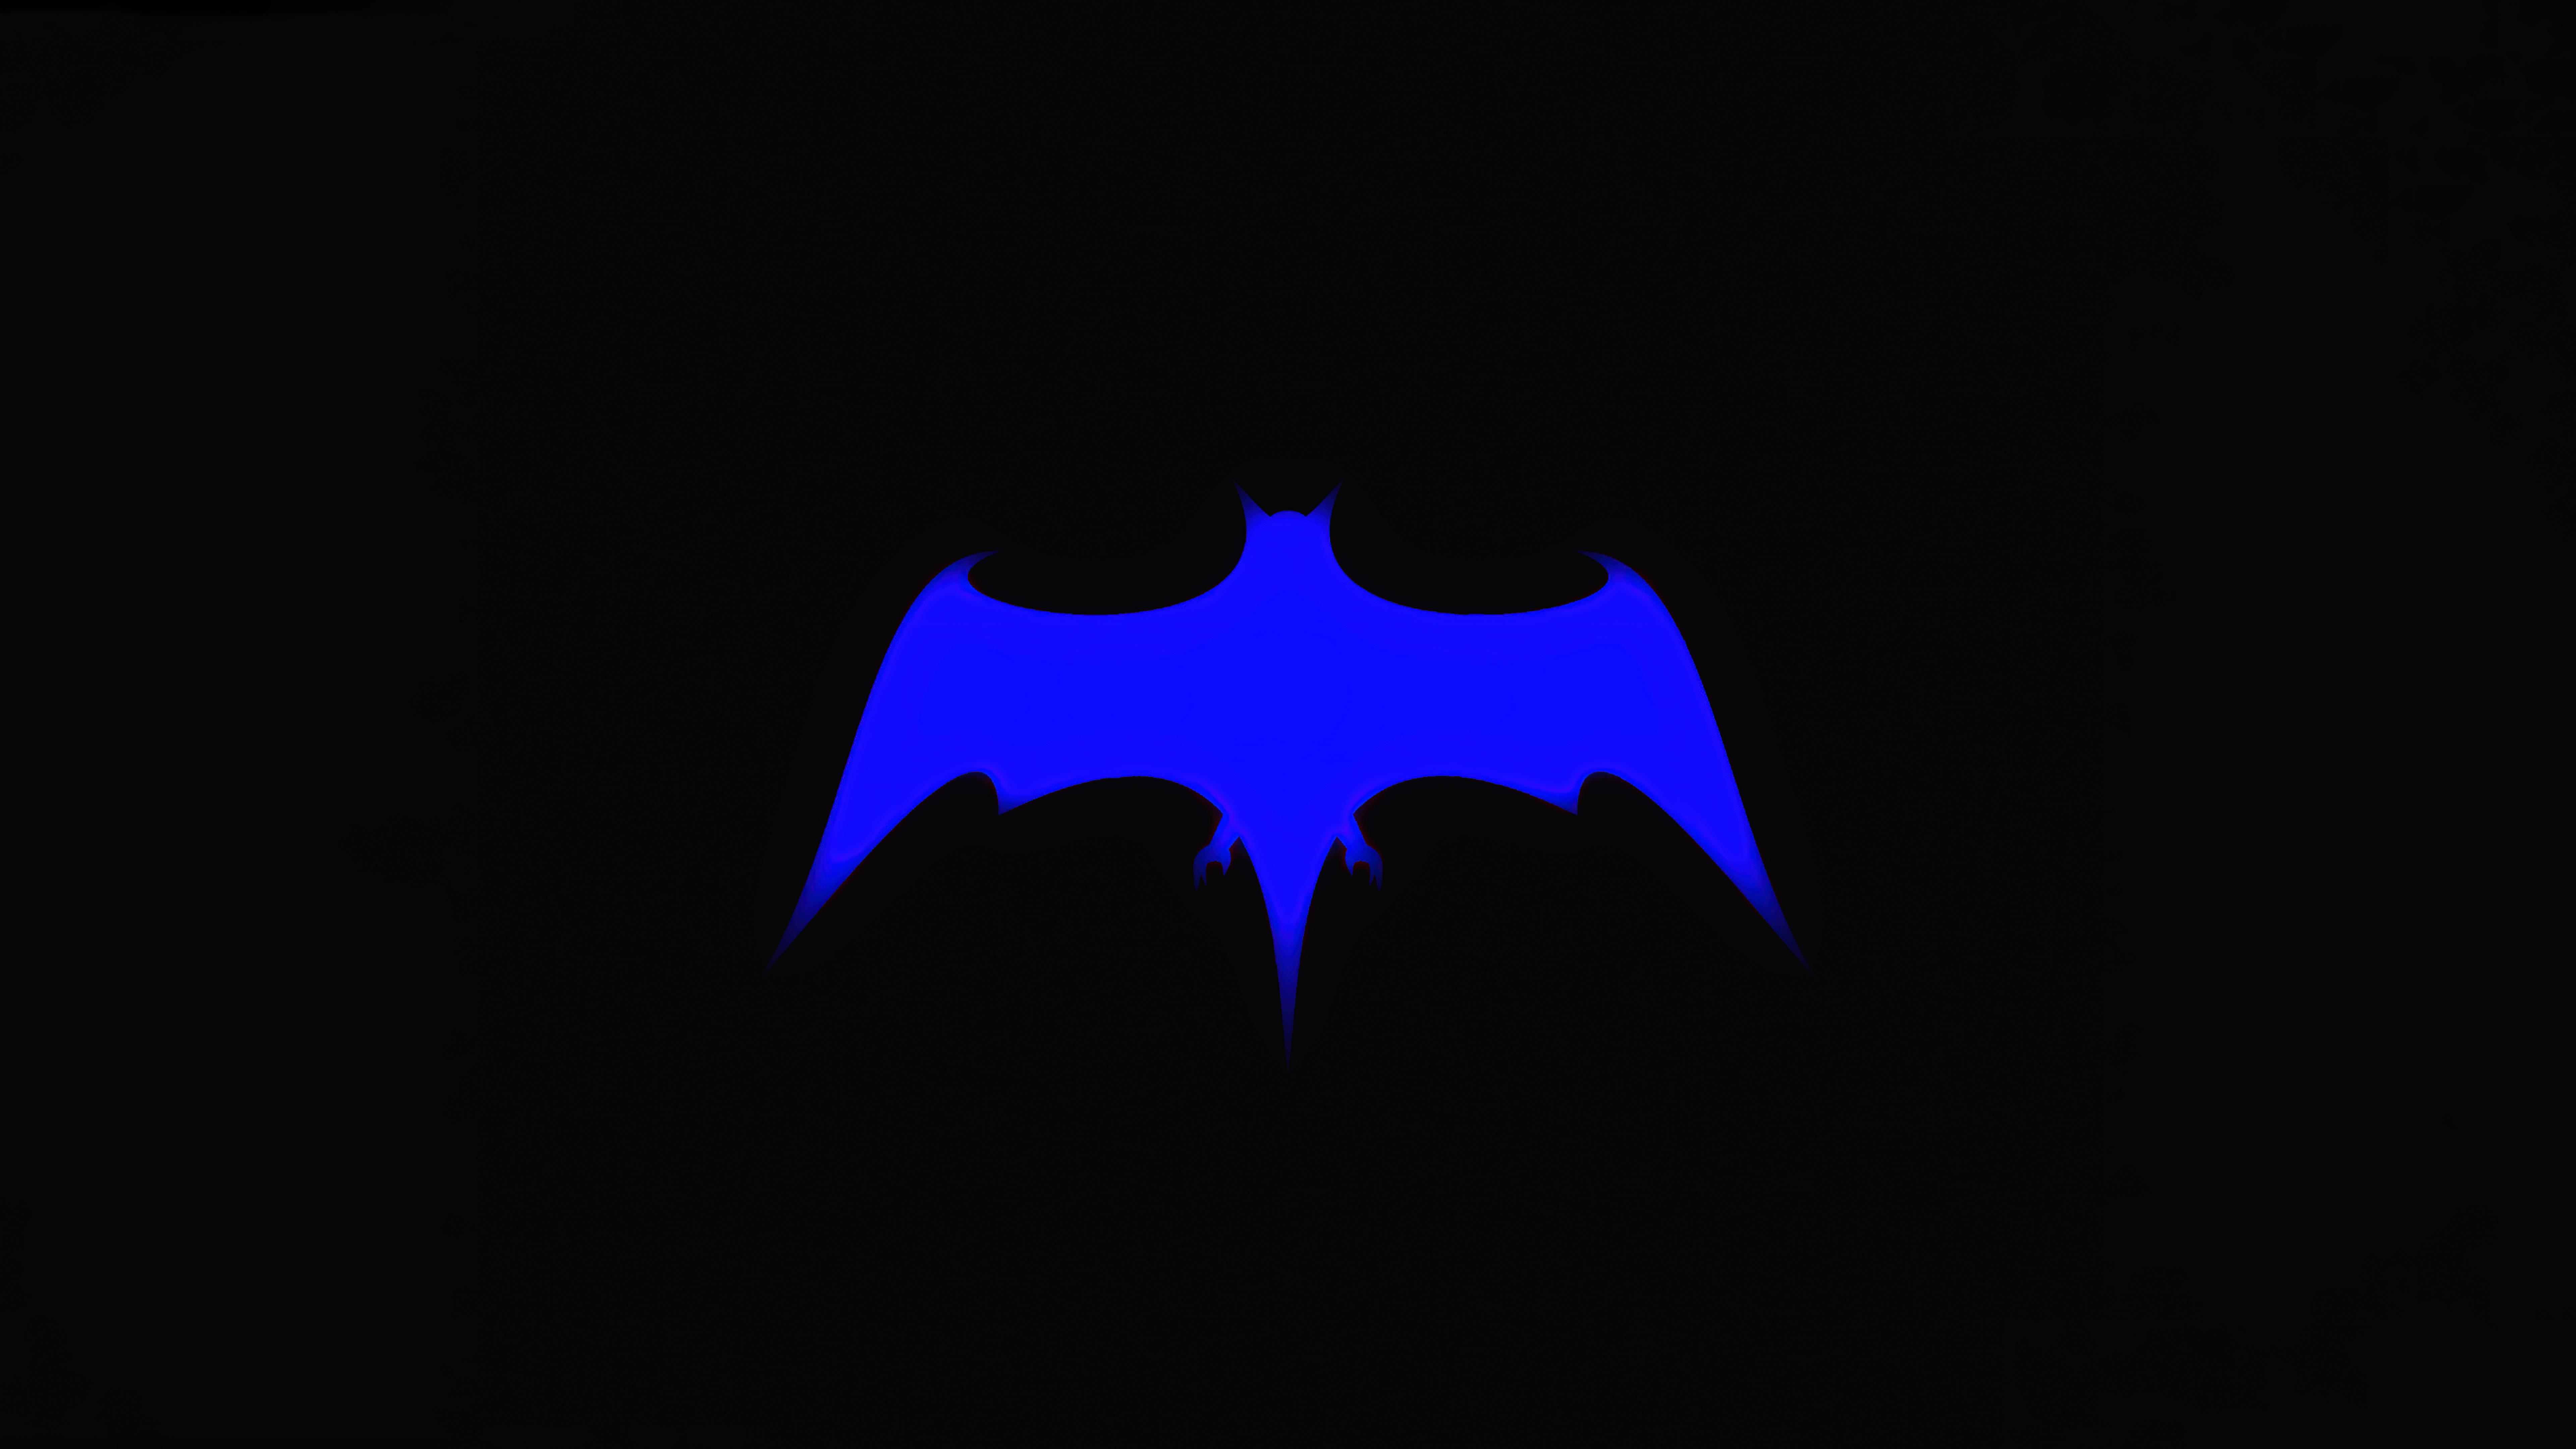 bat symbol 4k 1618132771 - Bat Symbol 4k - Bat Symbol 4k wallpapers